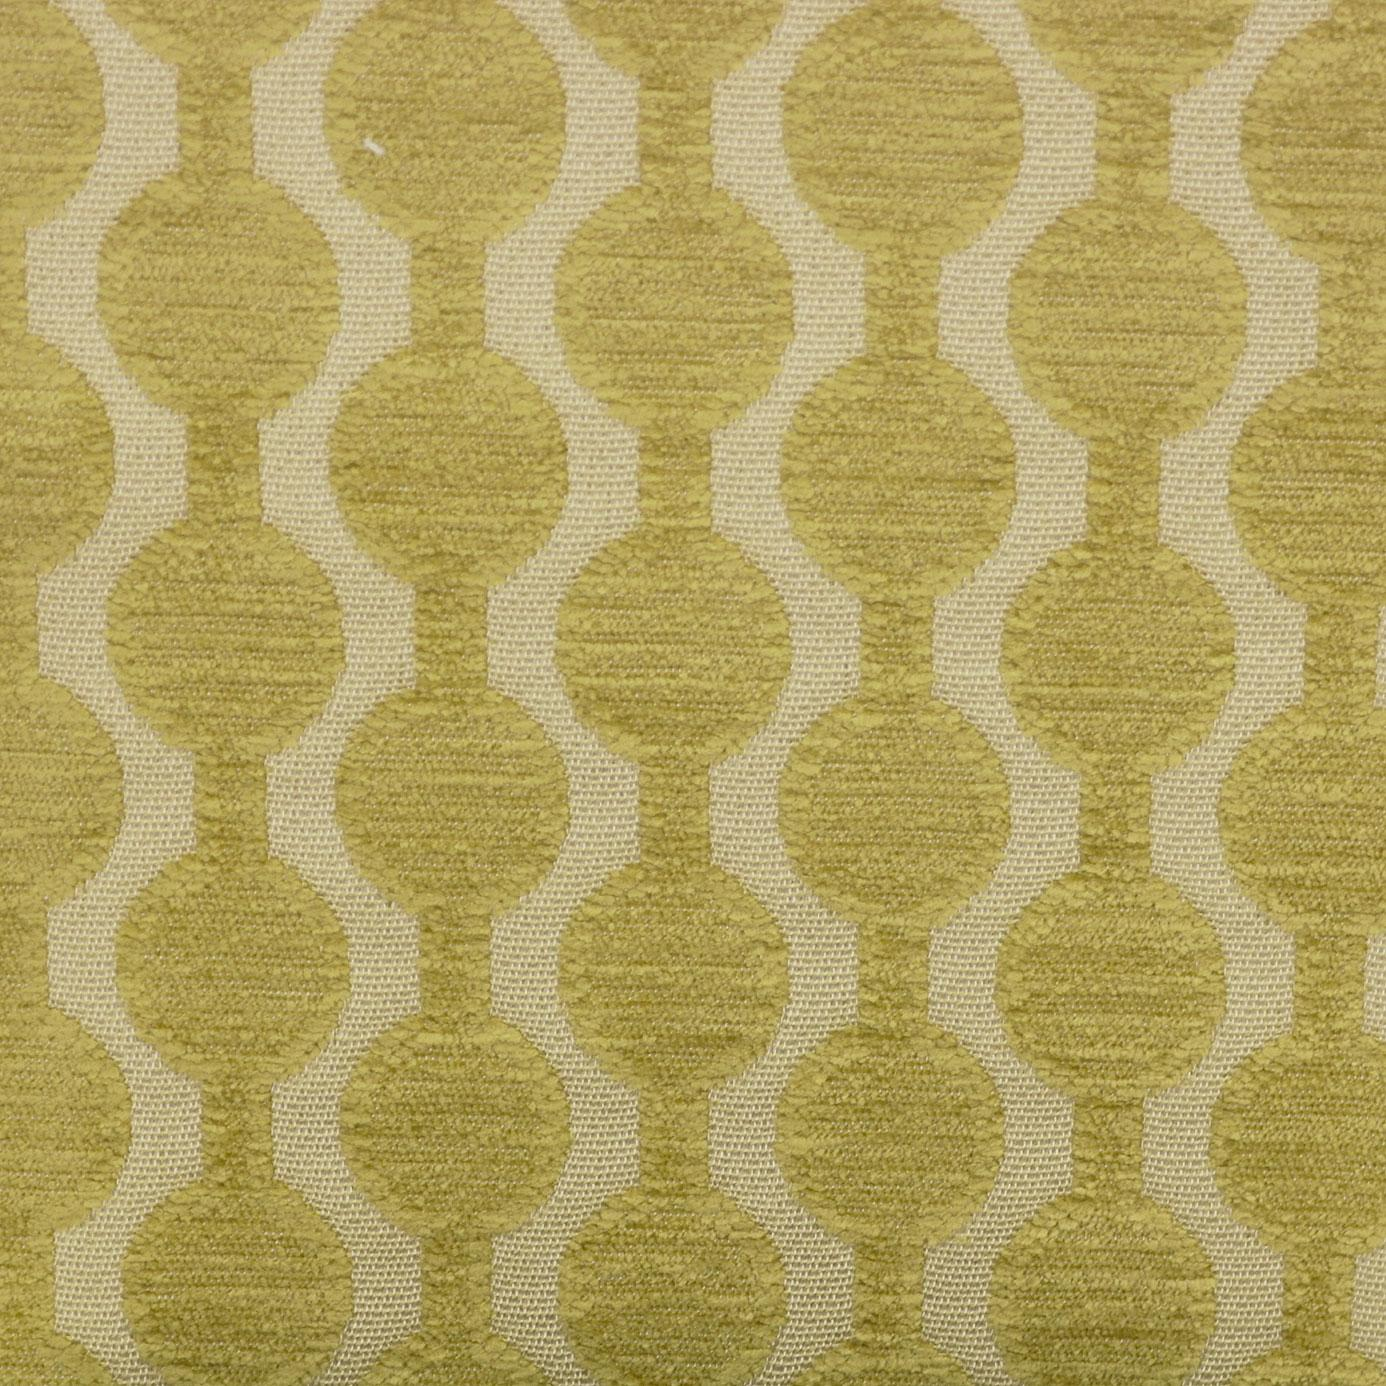 Lazzaro Fabric Citrus F0433 05 Clarke Amp Clarke